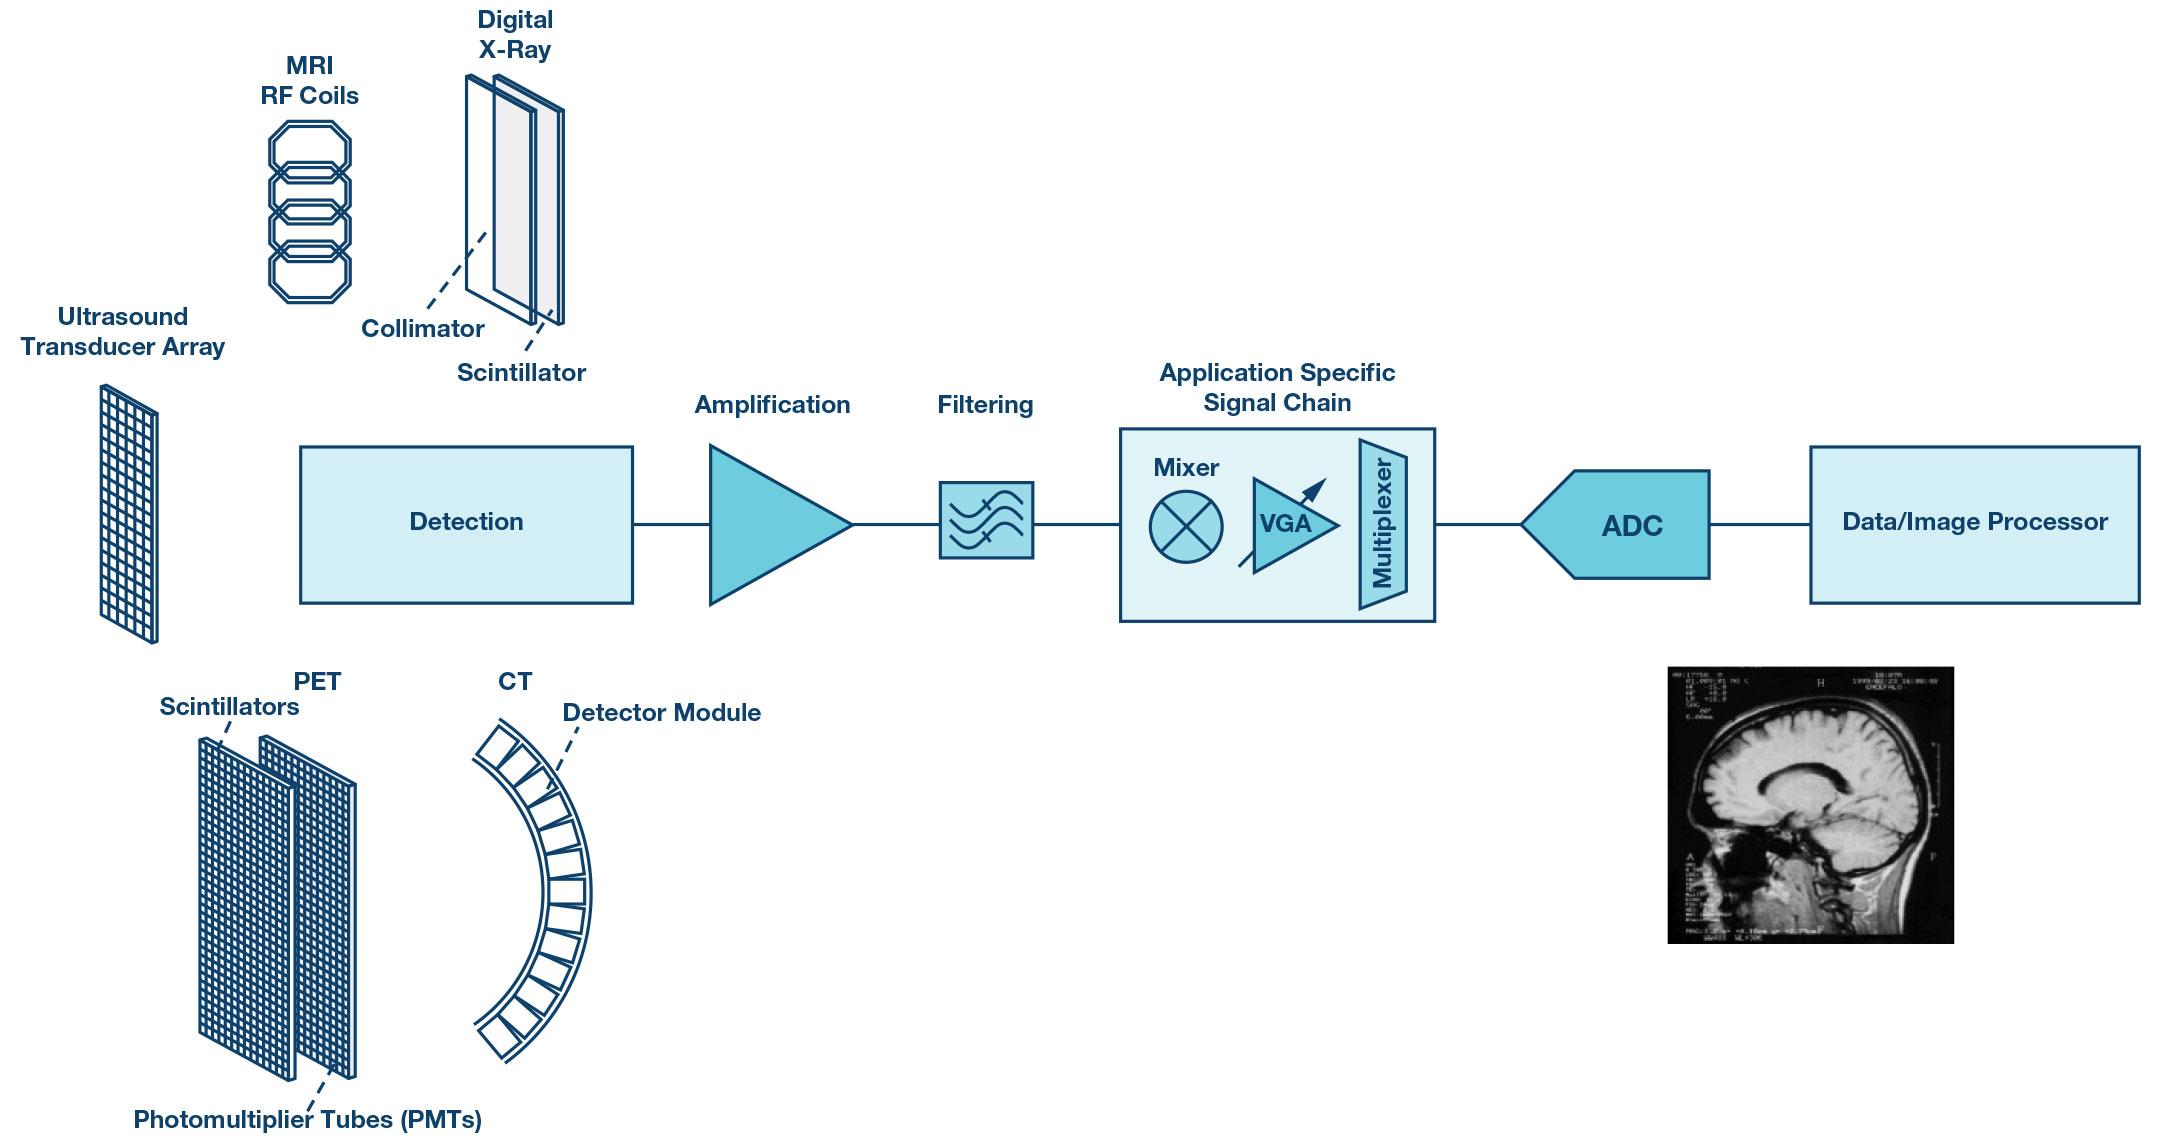 generic block diagram of the data acquisition process  [ 2163 x 1145 Pixel ]